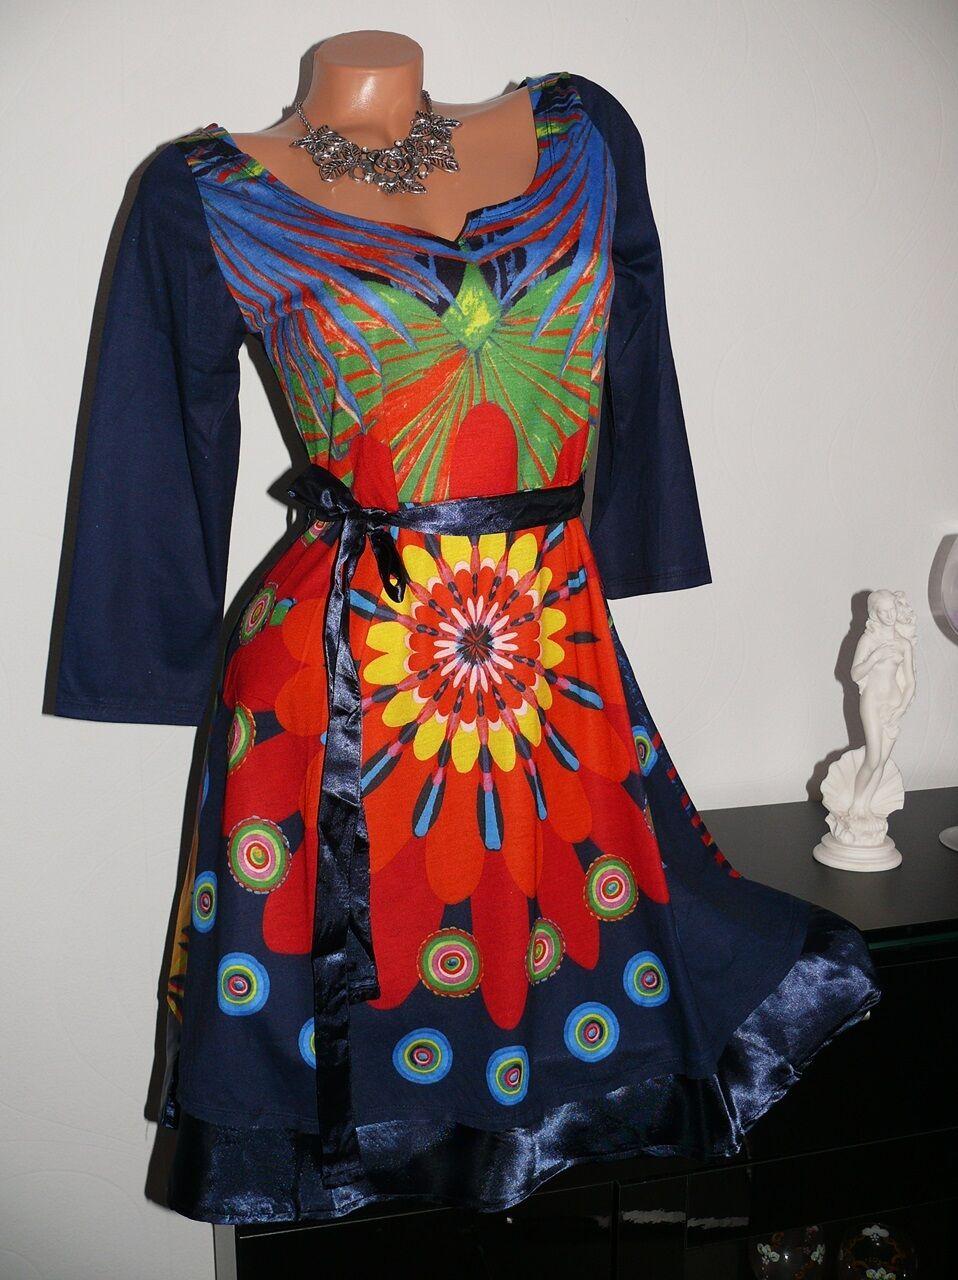 ♥ Design Kleid  Vintage A-Linie Floral Muster blueme blue  34 36 38 40 42 gr NEU♥